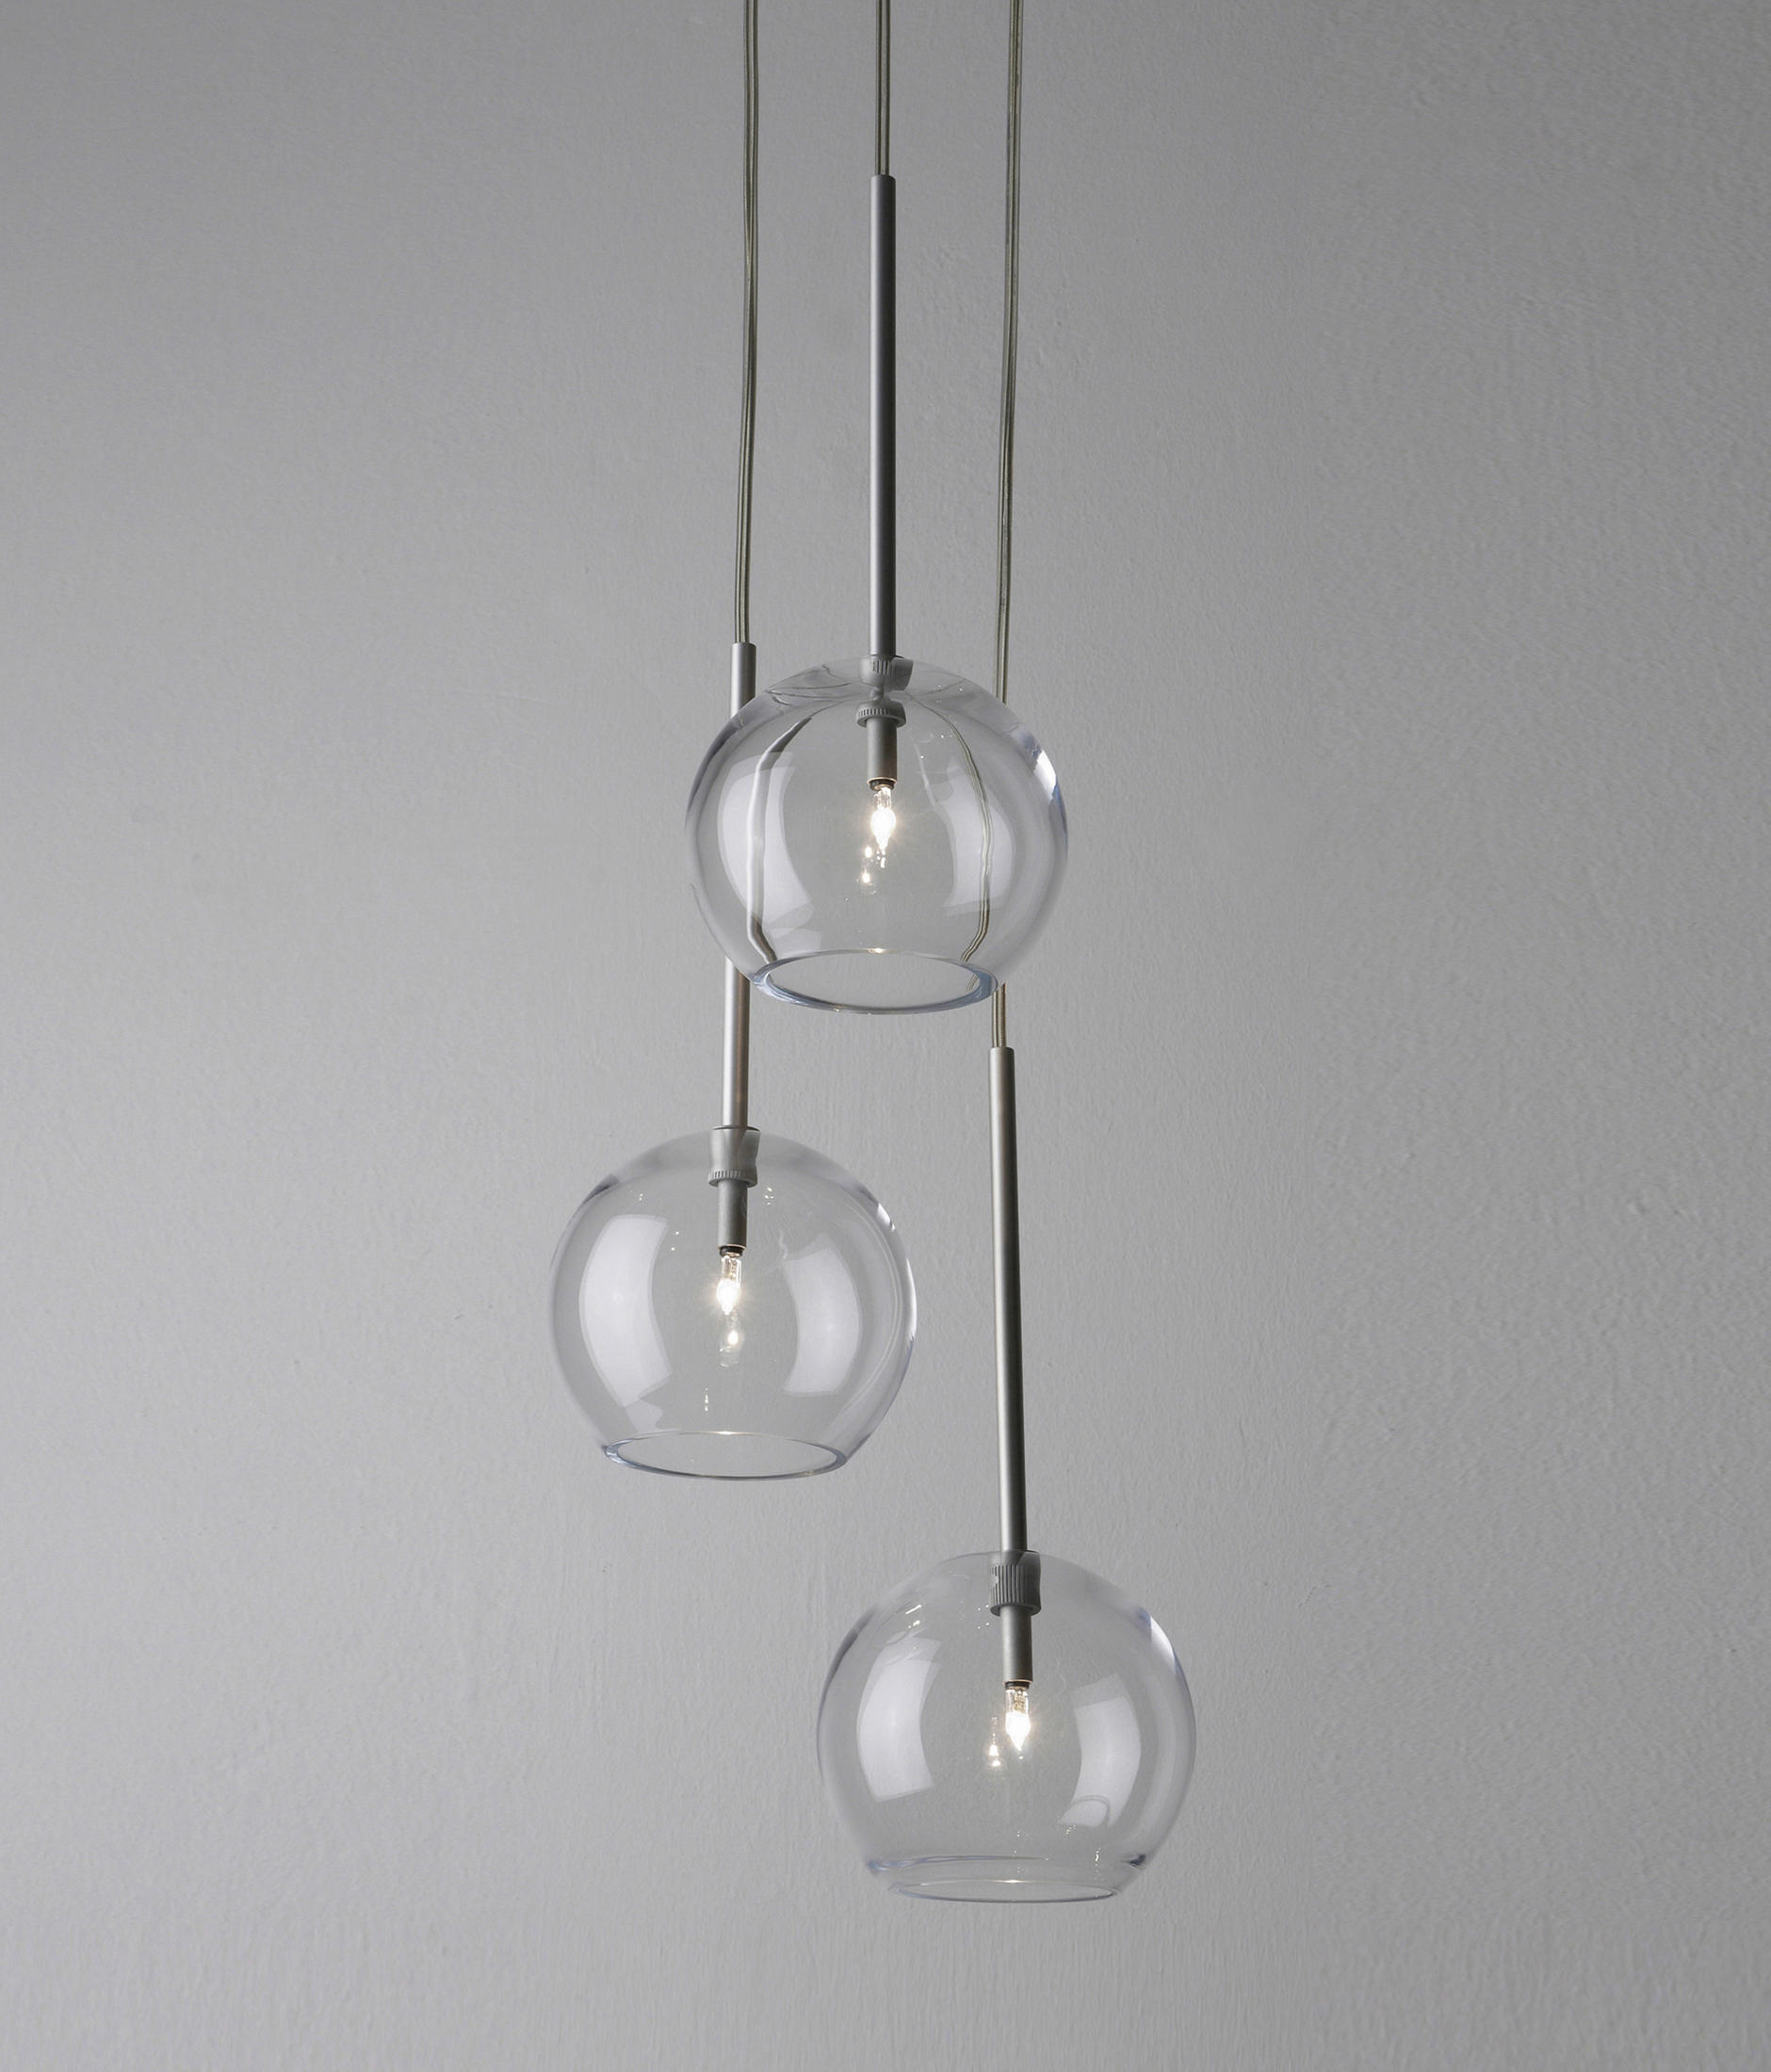 swag luxury gold clear hanging light chandeliers fixtures chandelier in rustic living pendant room glass